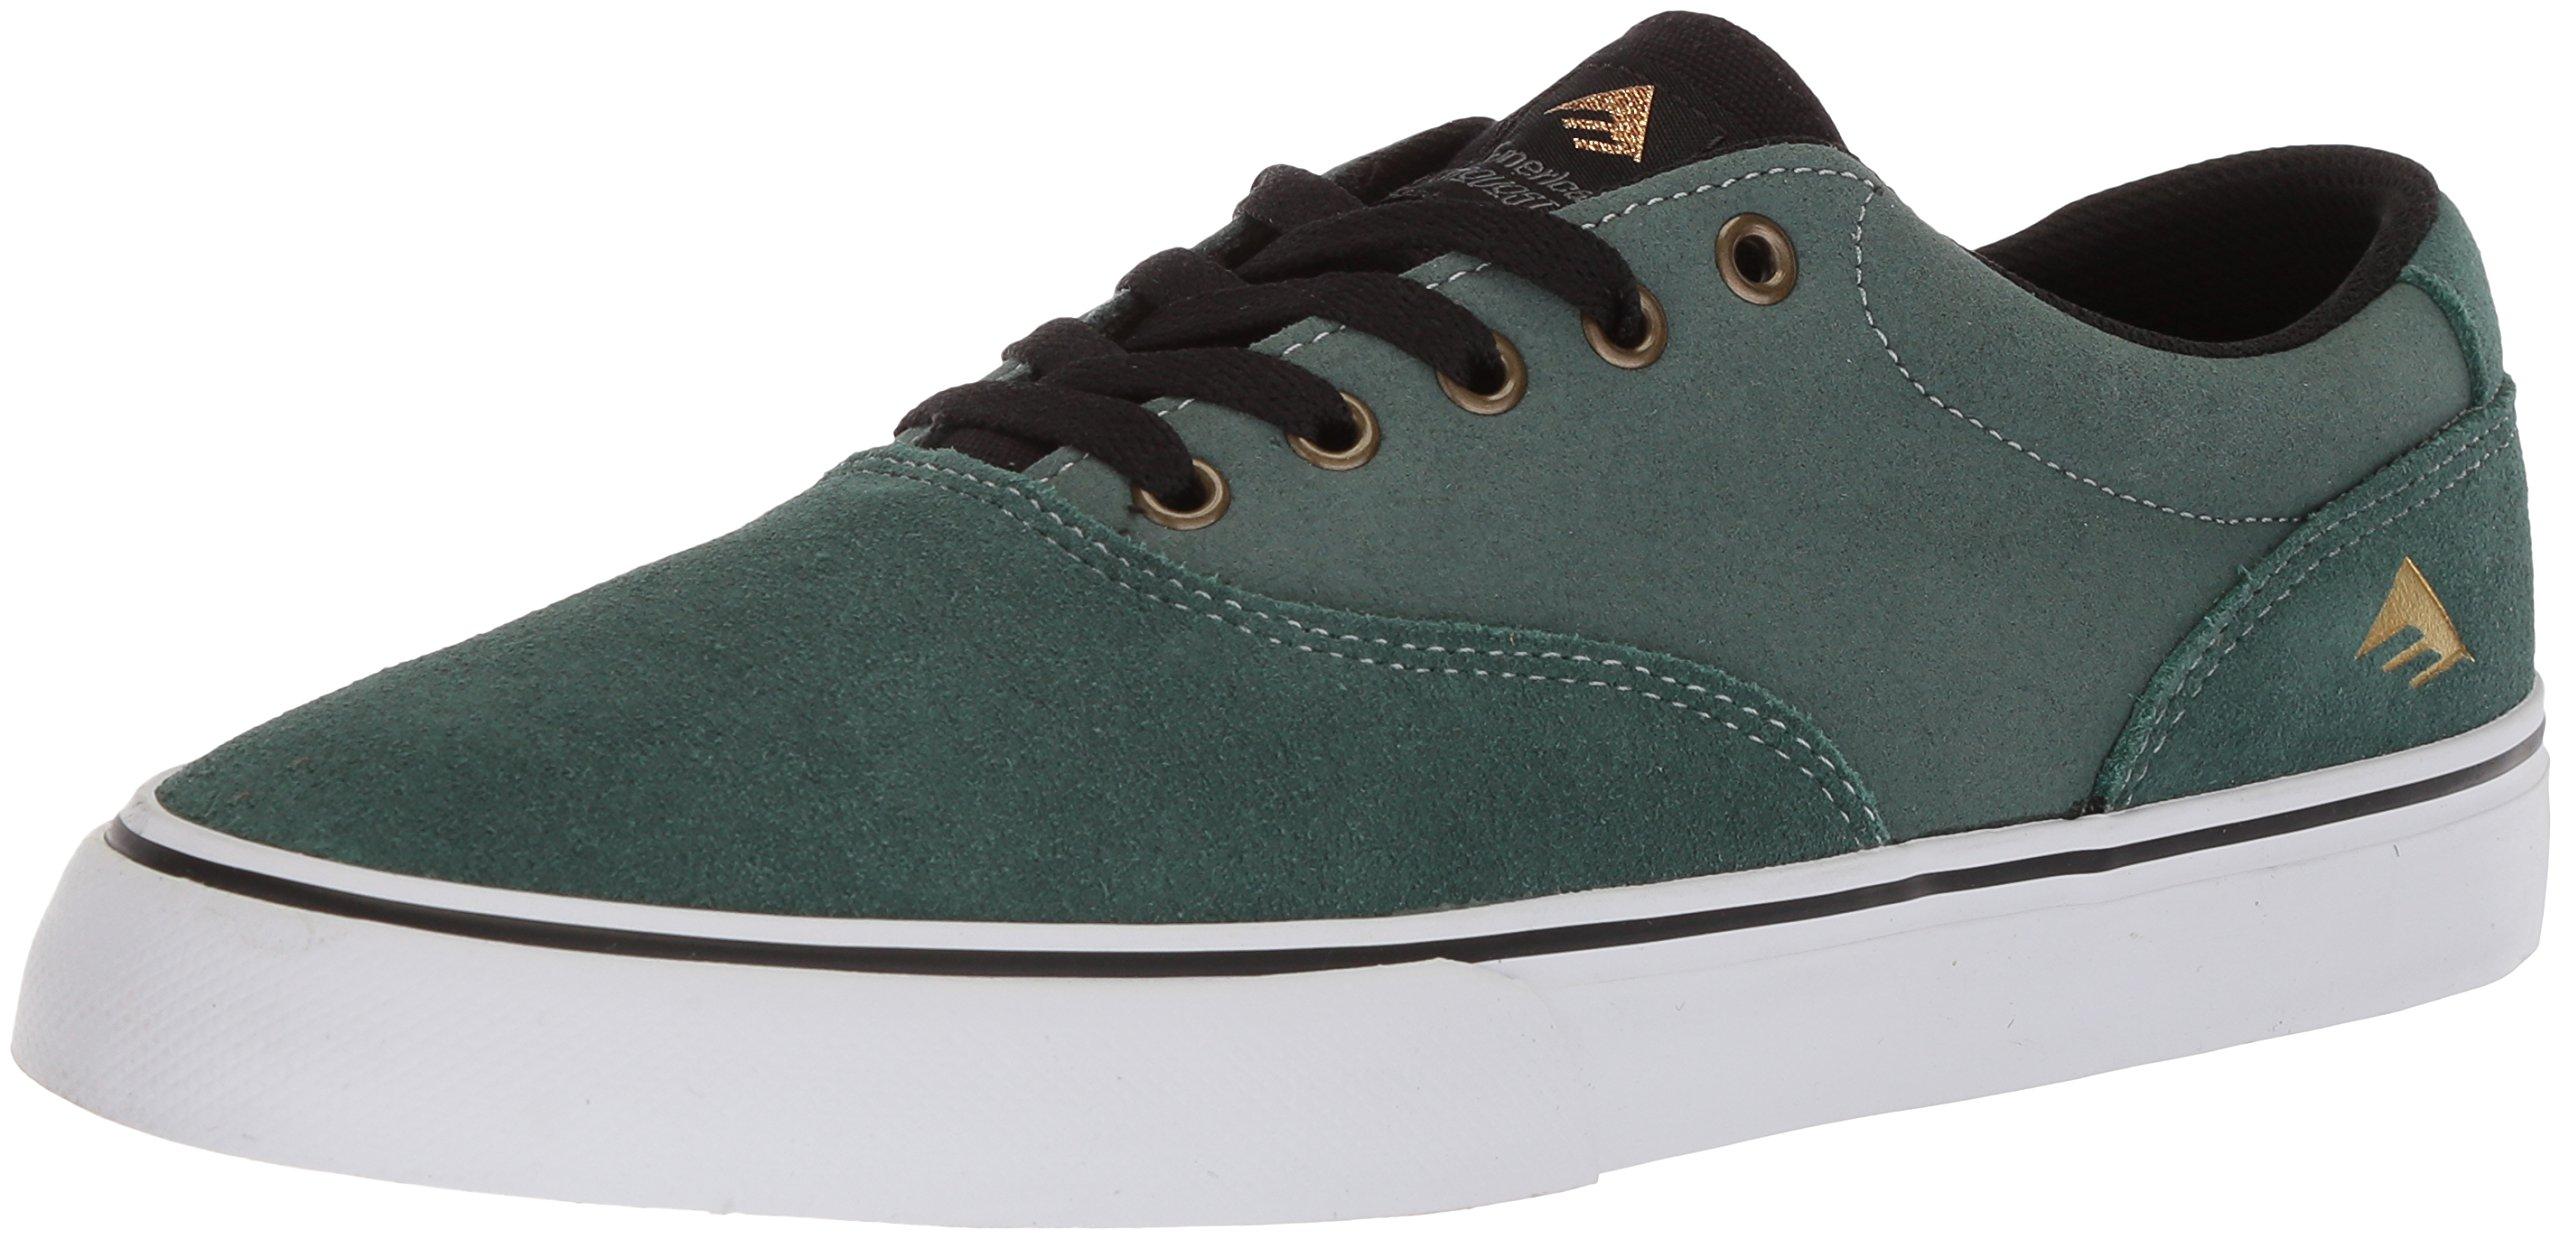 Emerica Provost Slim Vulc Skate Shoe,turquoise,13